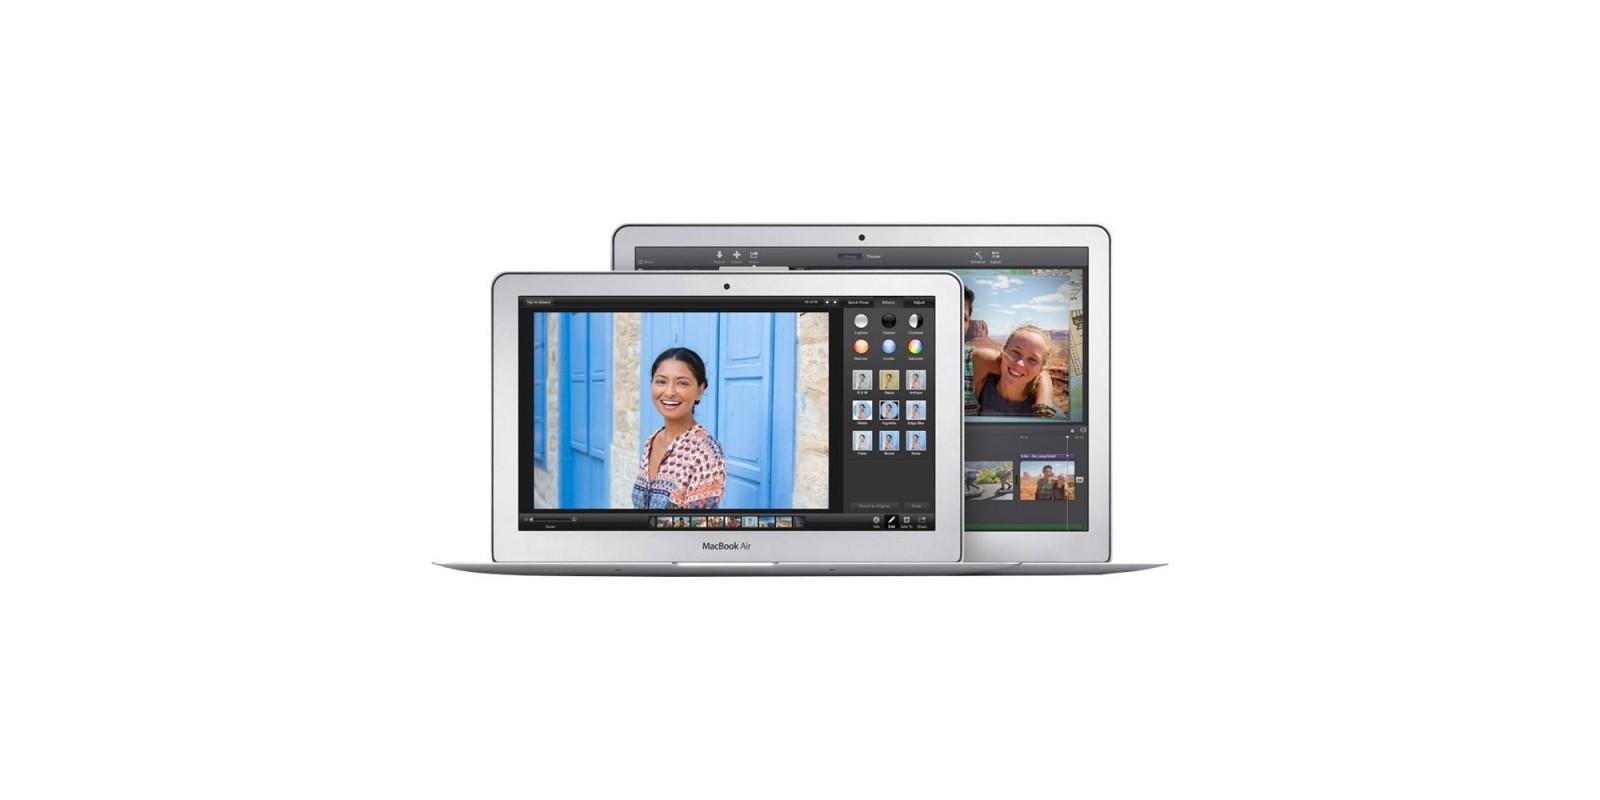 Apple MacBook Air MJVE2LL Sizes